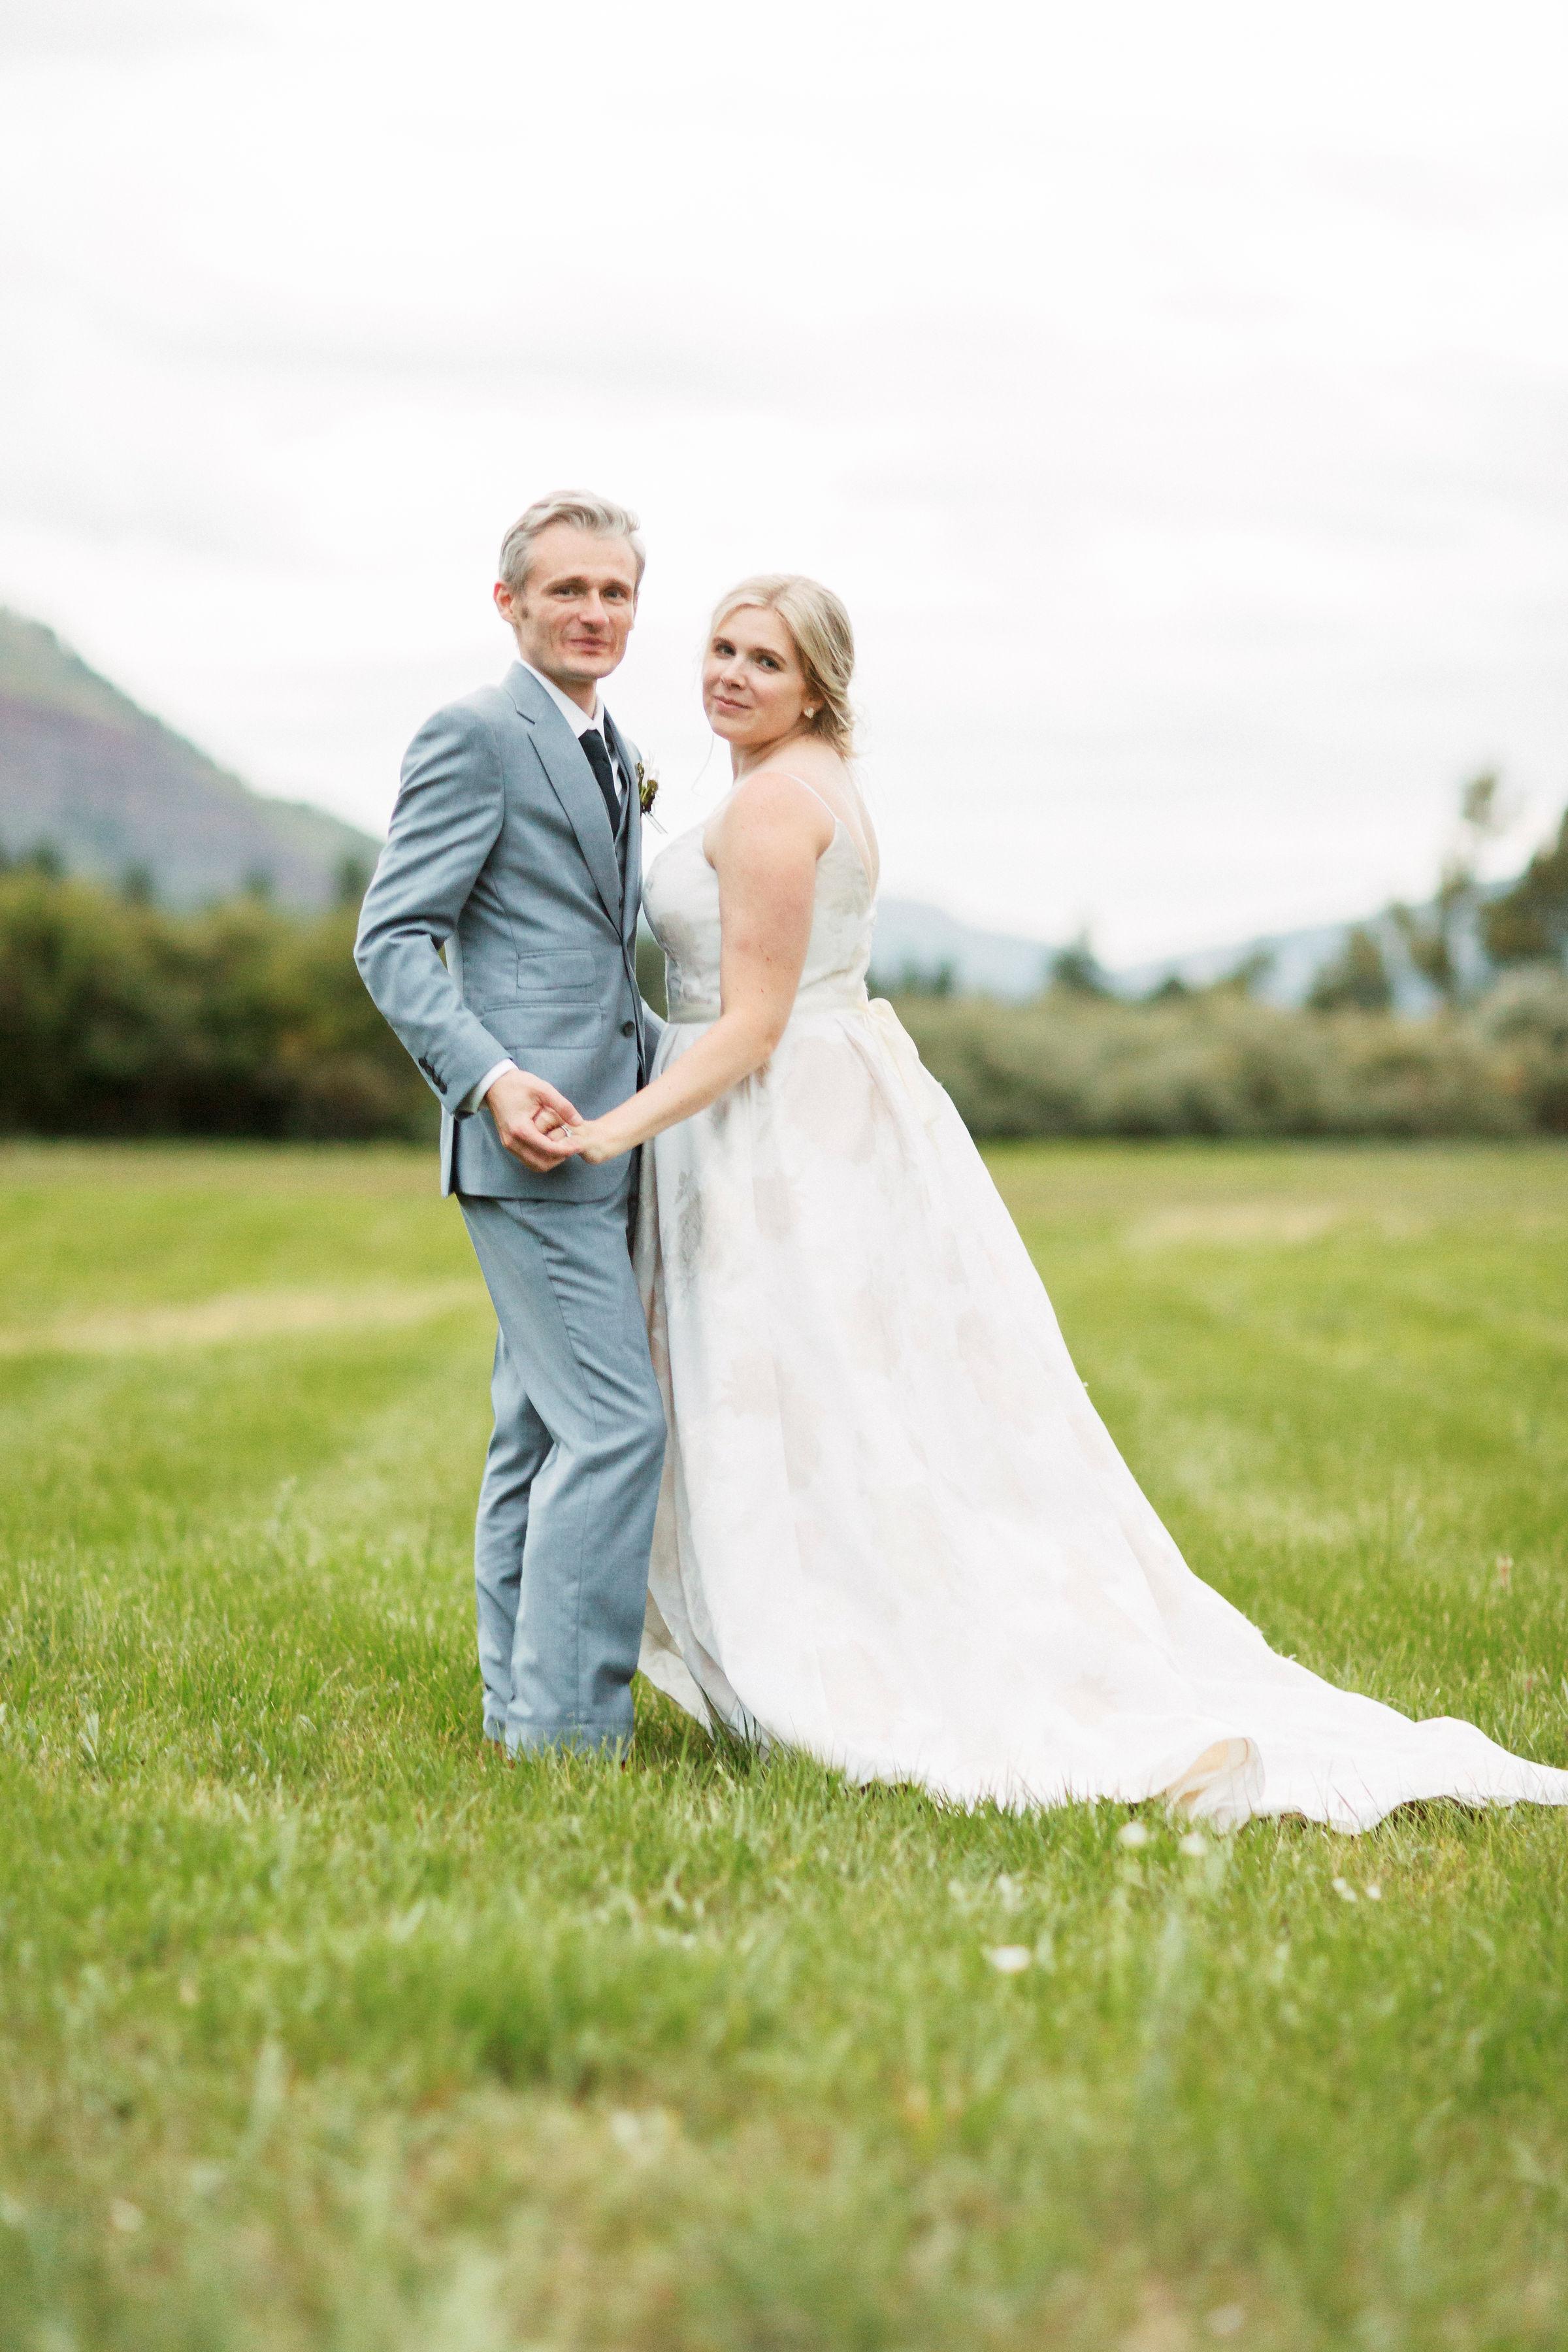 766-arek-allison-durango-wedding-lucky-malone.jpg